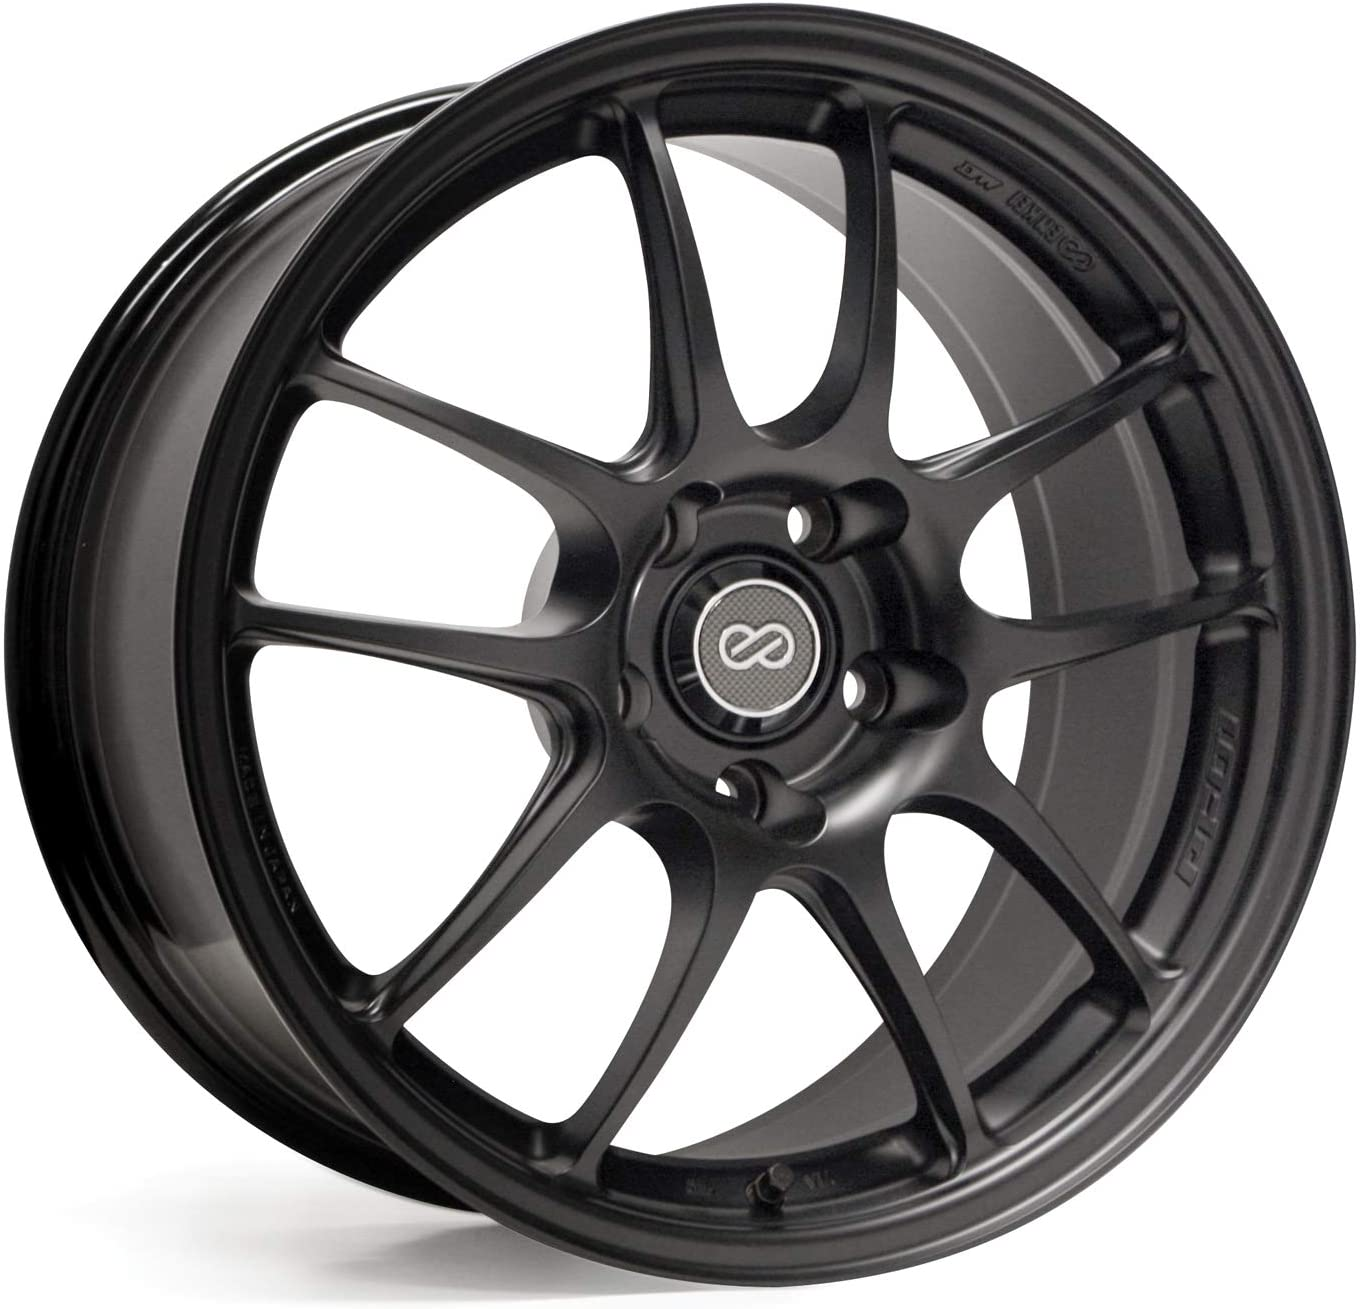 Enkei PF01 Racing Series Wheel 18x10.5 5x114.3 47mm Offset Matte Black